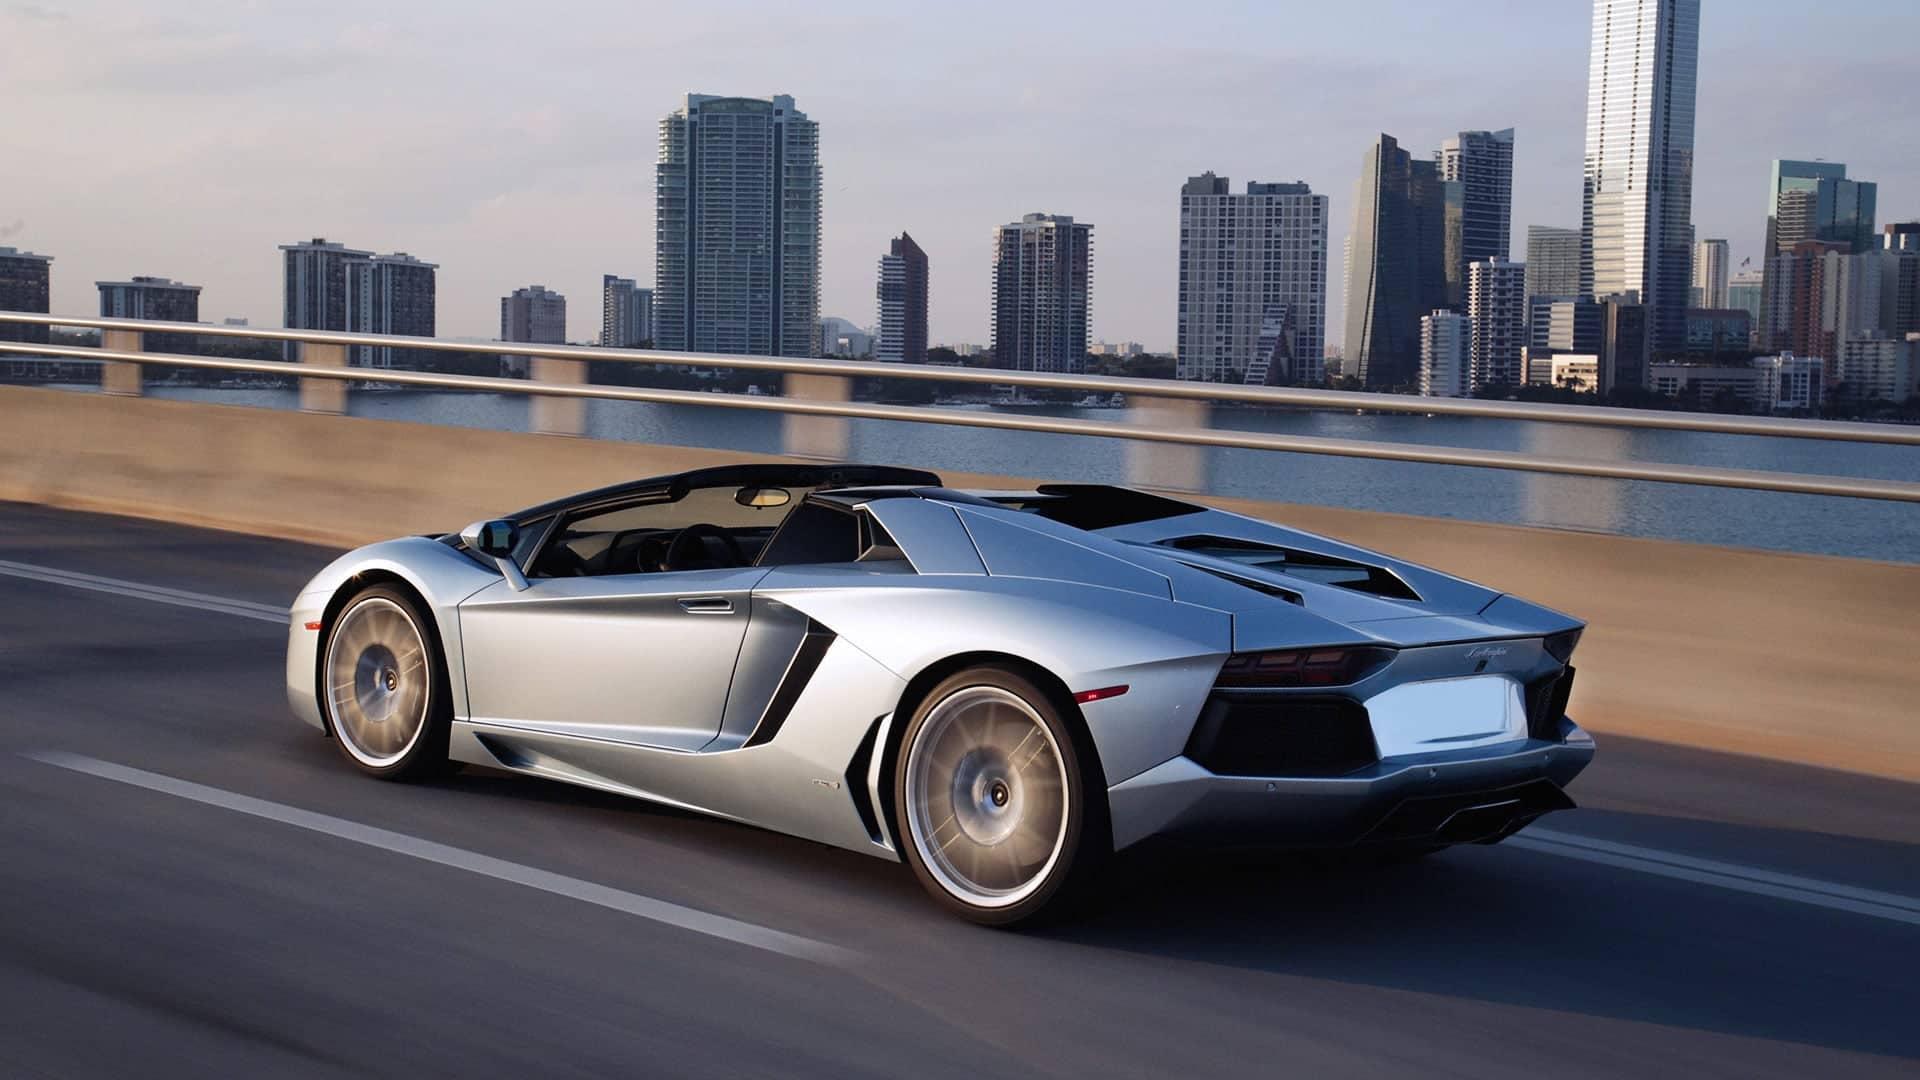 Lamborghini Aventador Roadster Pictures Videos